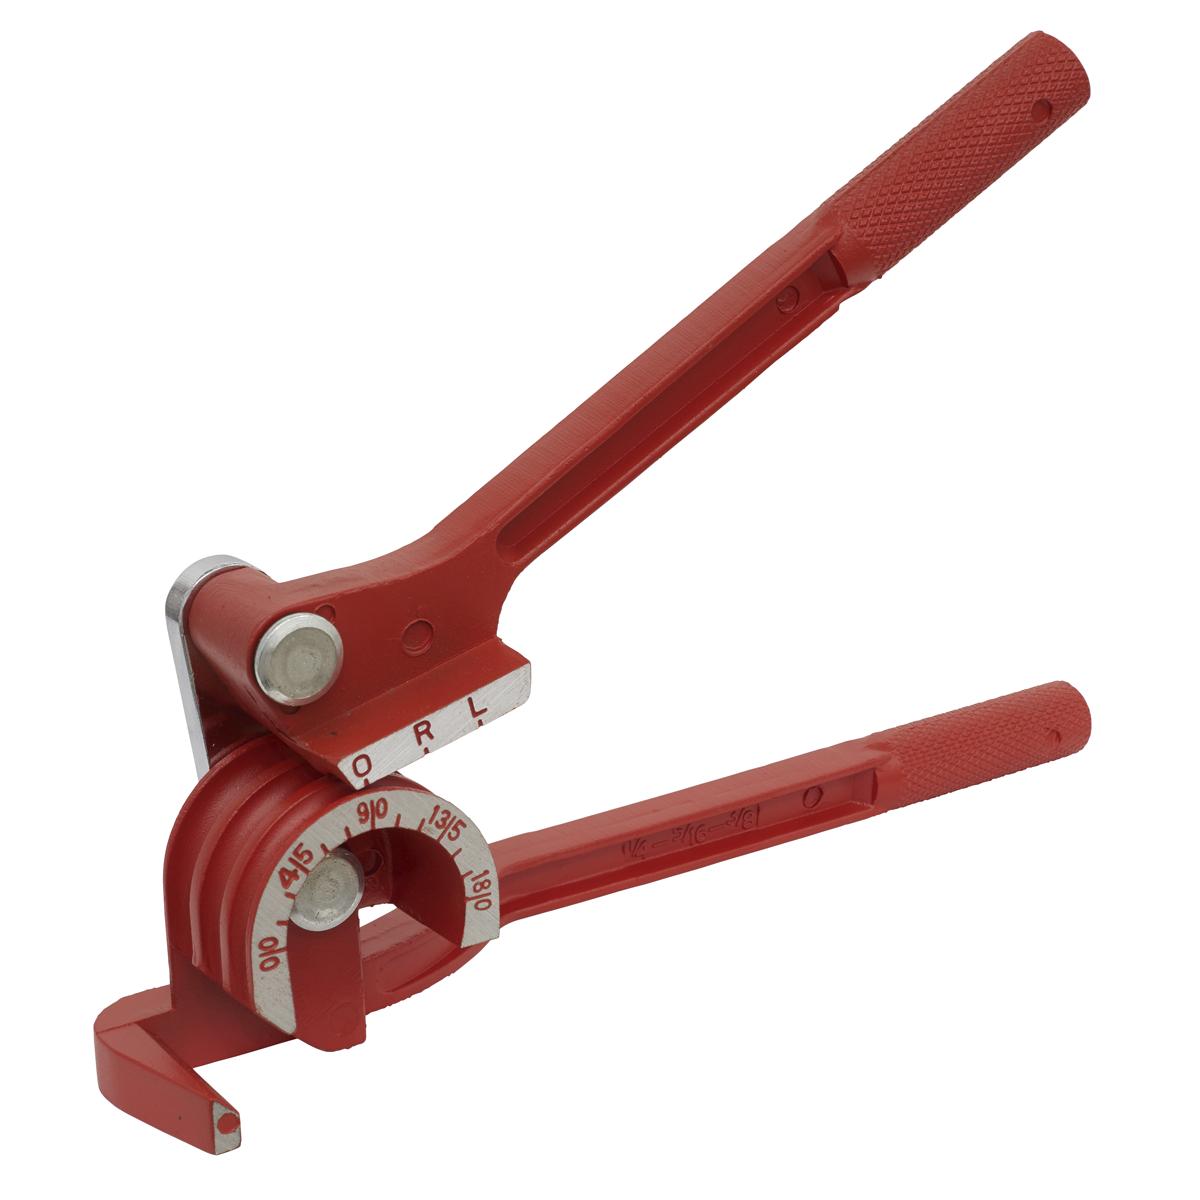 Brake Pipe Bender 3-in-1 Automotive 6, 8 & 10mm